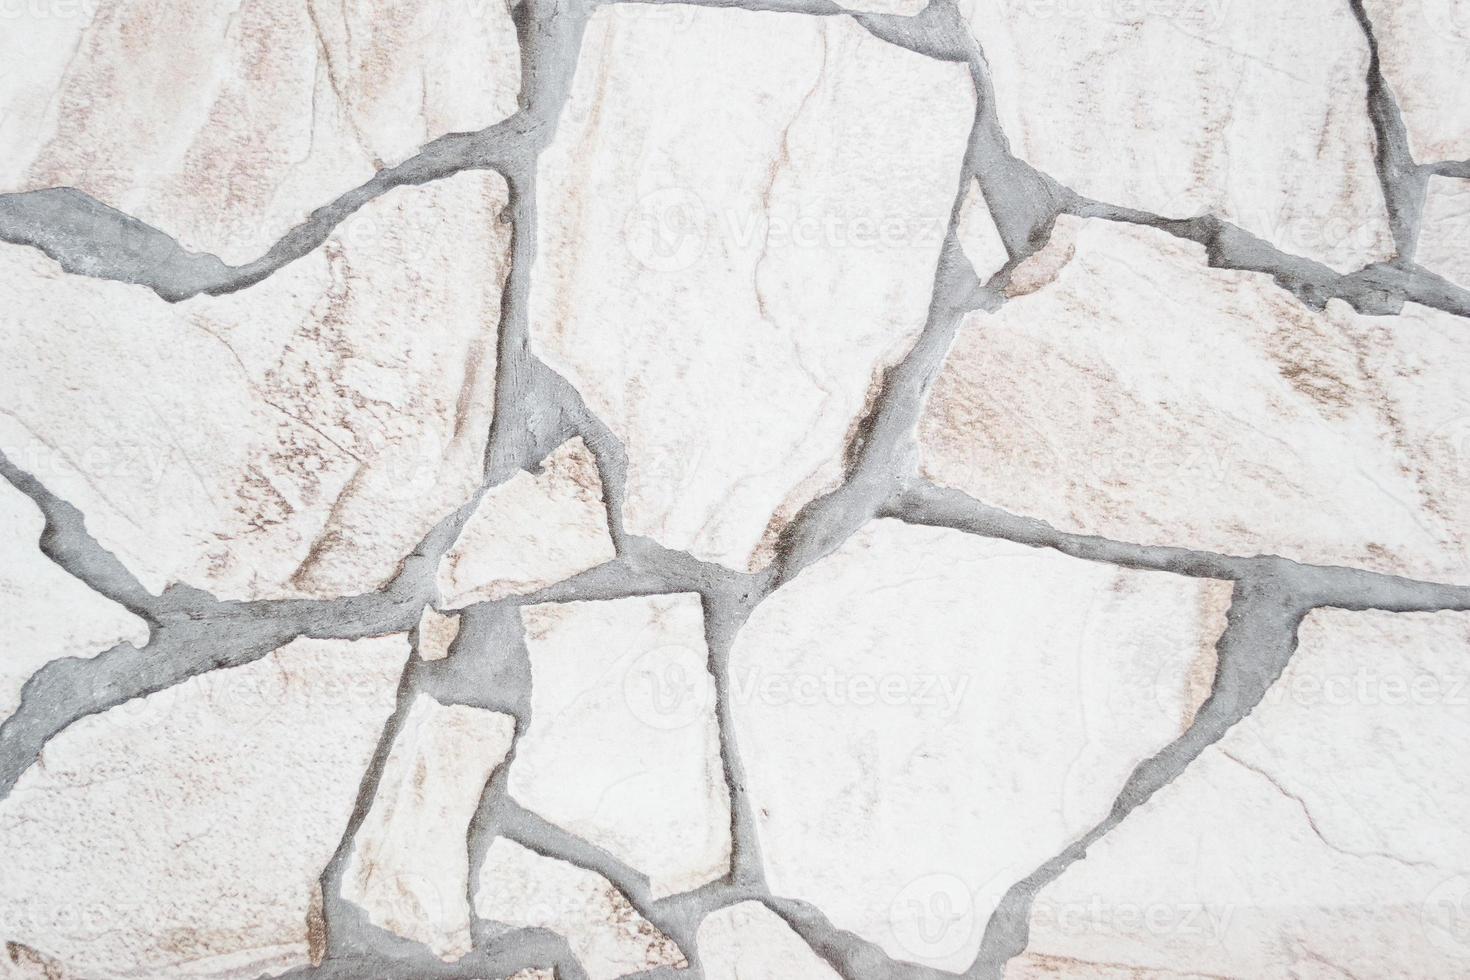 Fondo de piedras de cerca foto